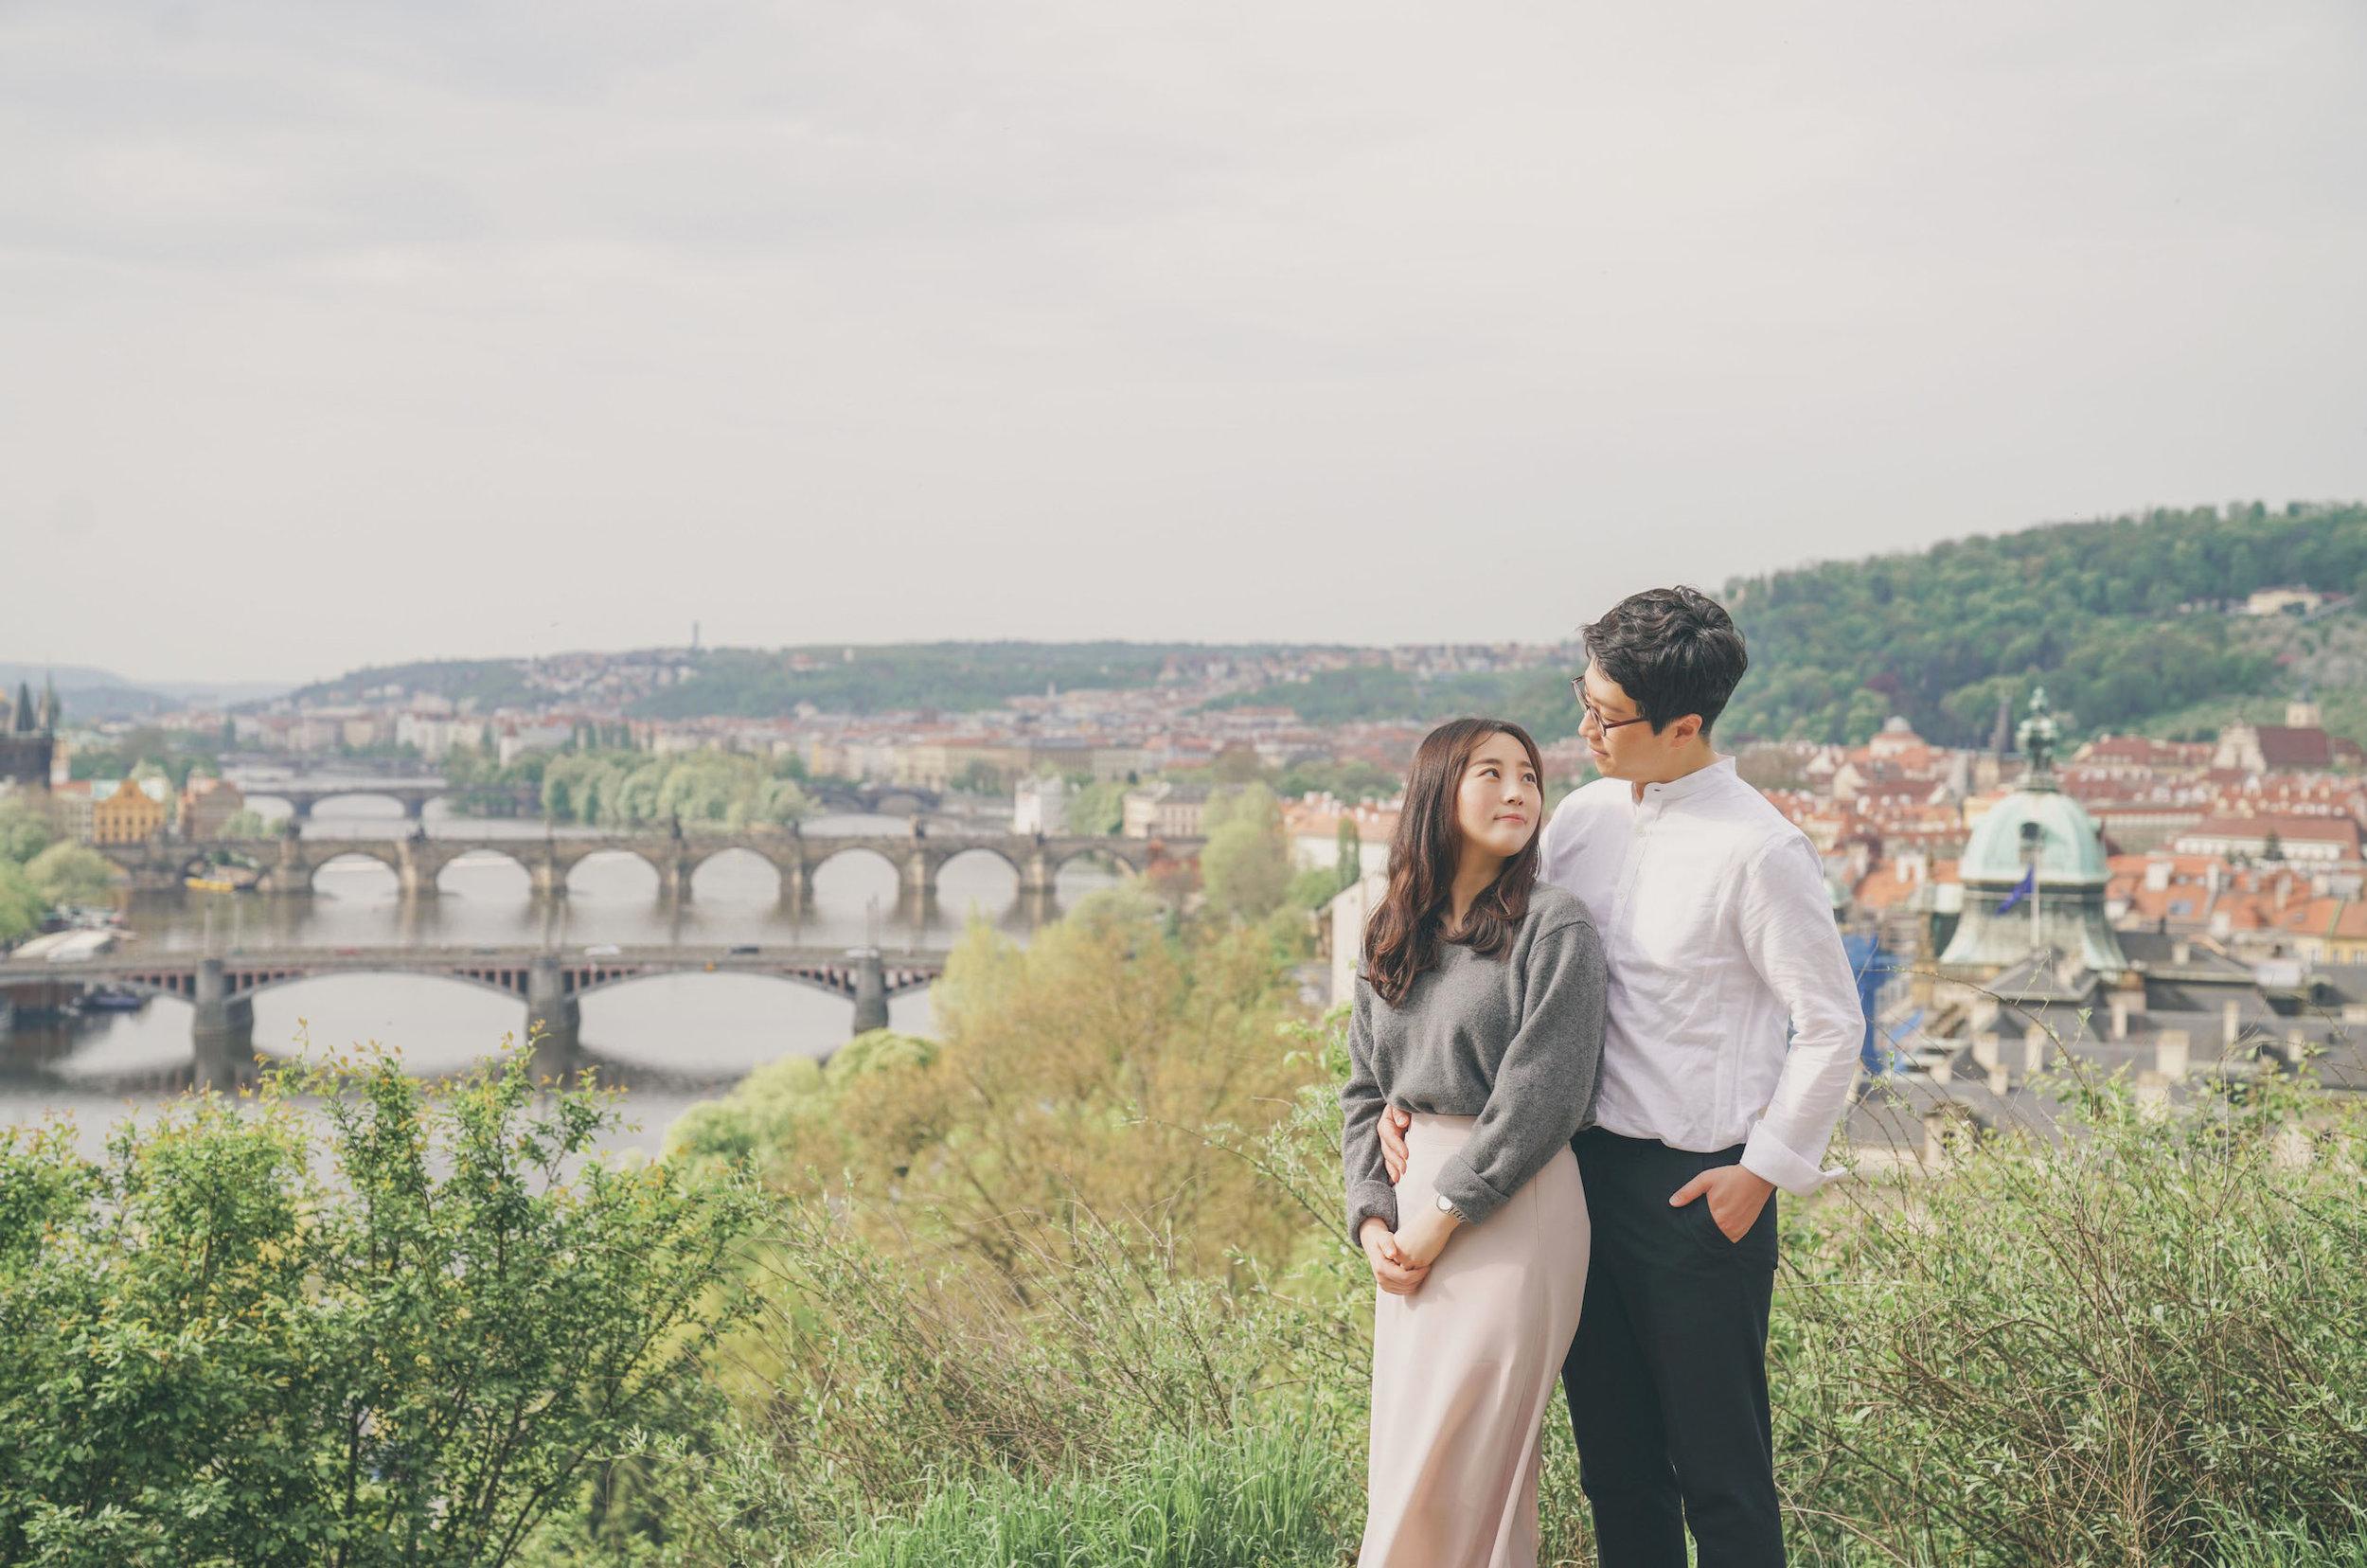 Sprazzi_Professional_Photography_Photographer_Prague_Czech-Republic_Irene_Original_38.jpg